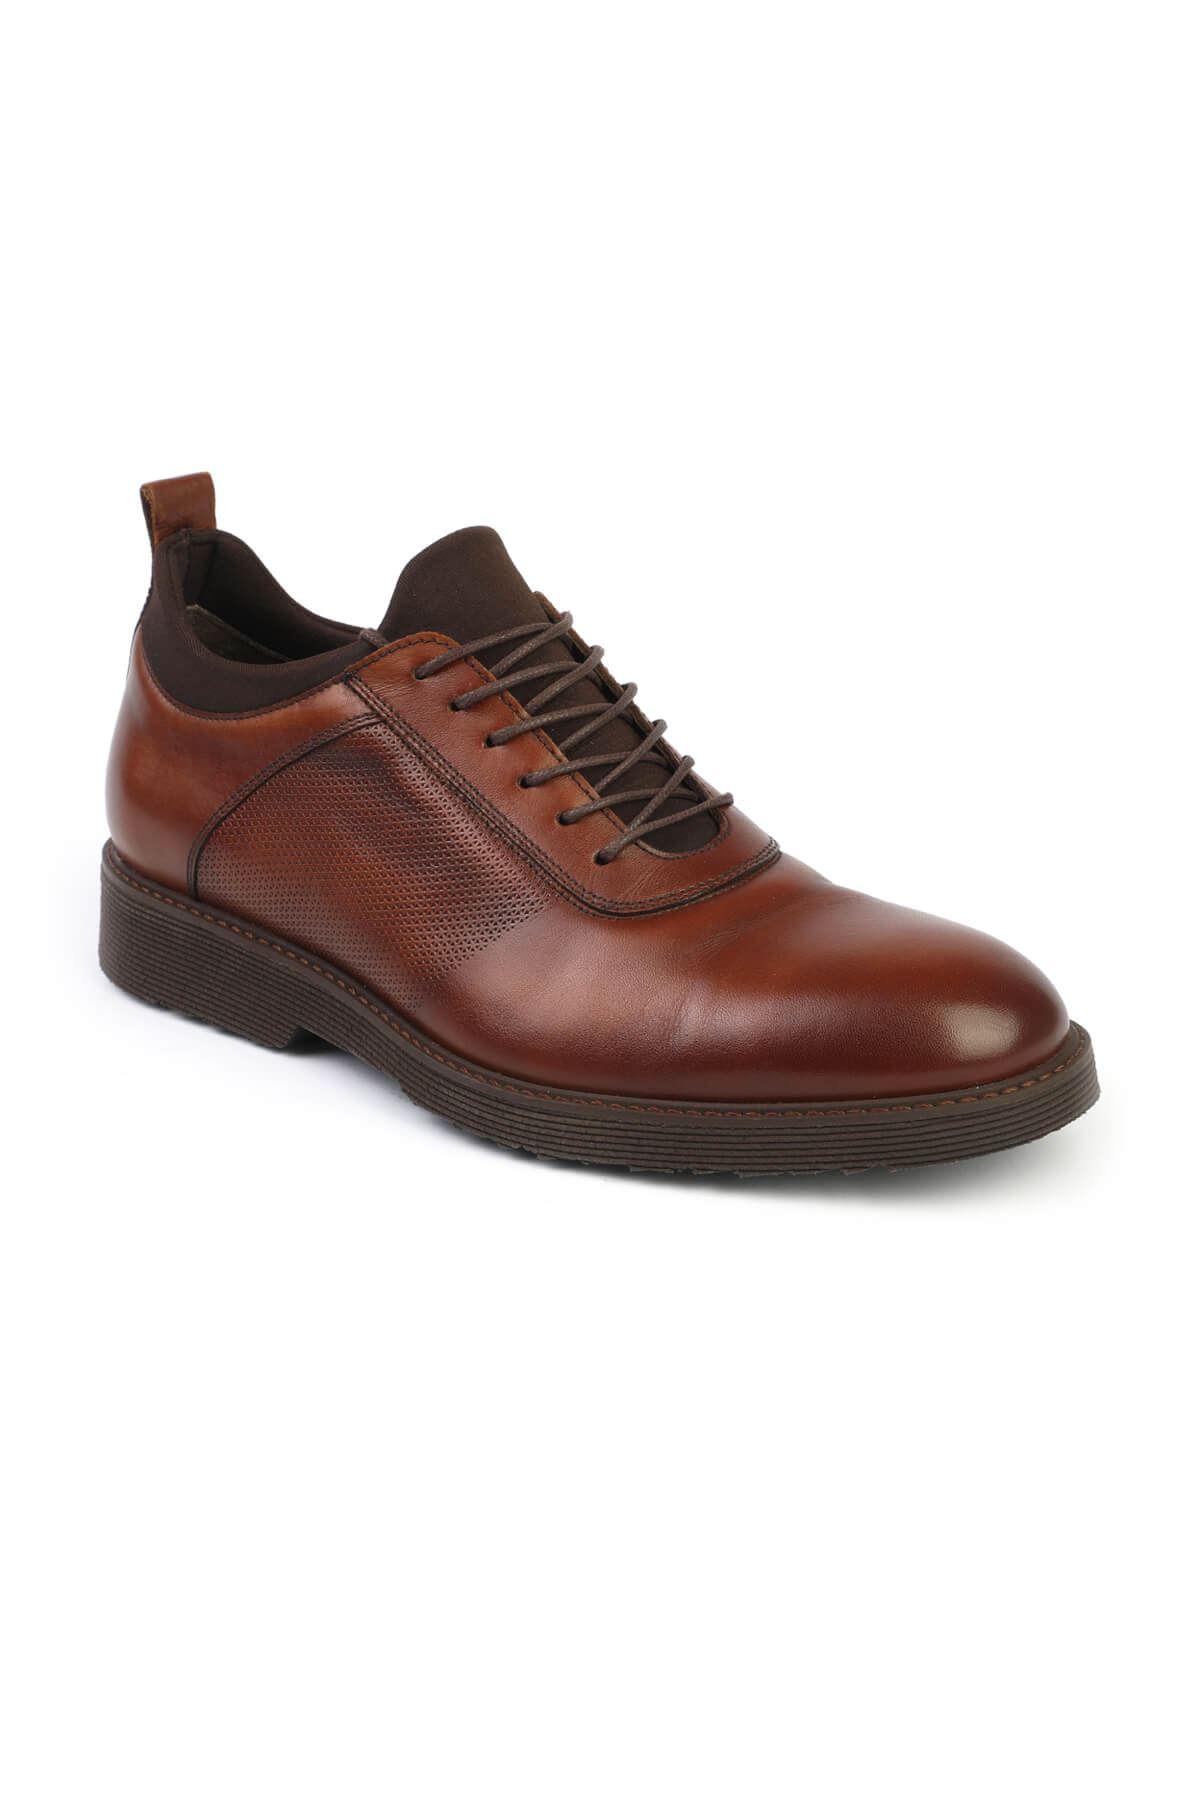 Libero 2999 Tan Casual Shoes